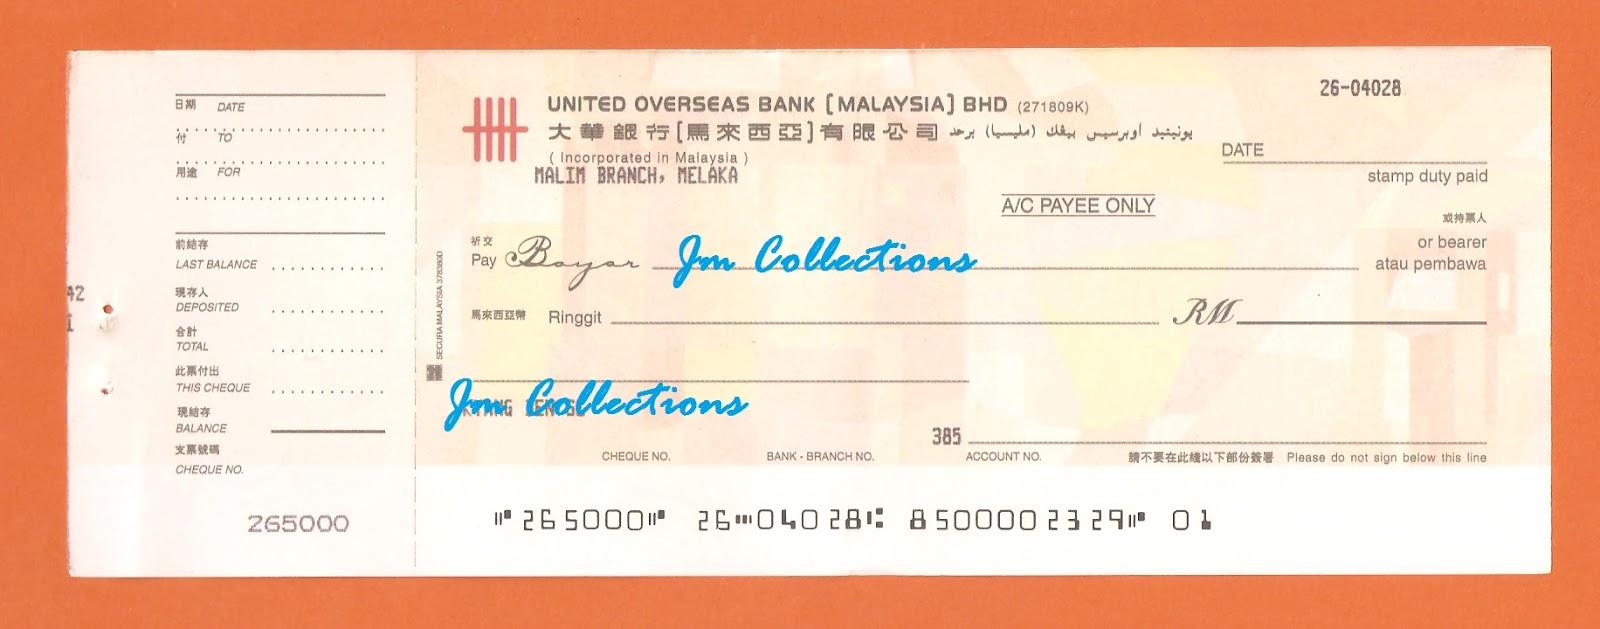 UNITED OVERSEAS BANK MALAYSIA BERHAD Branches' Swift